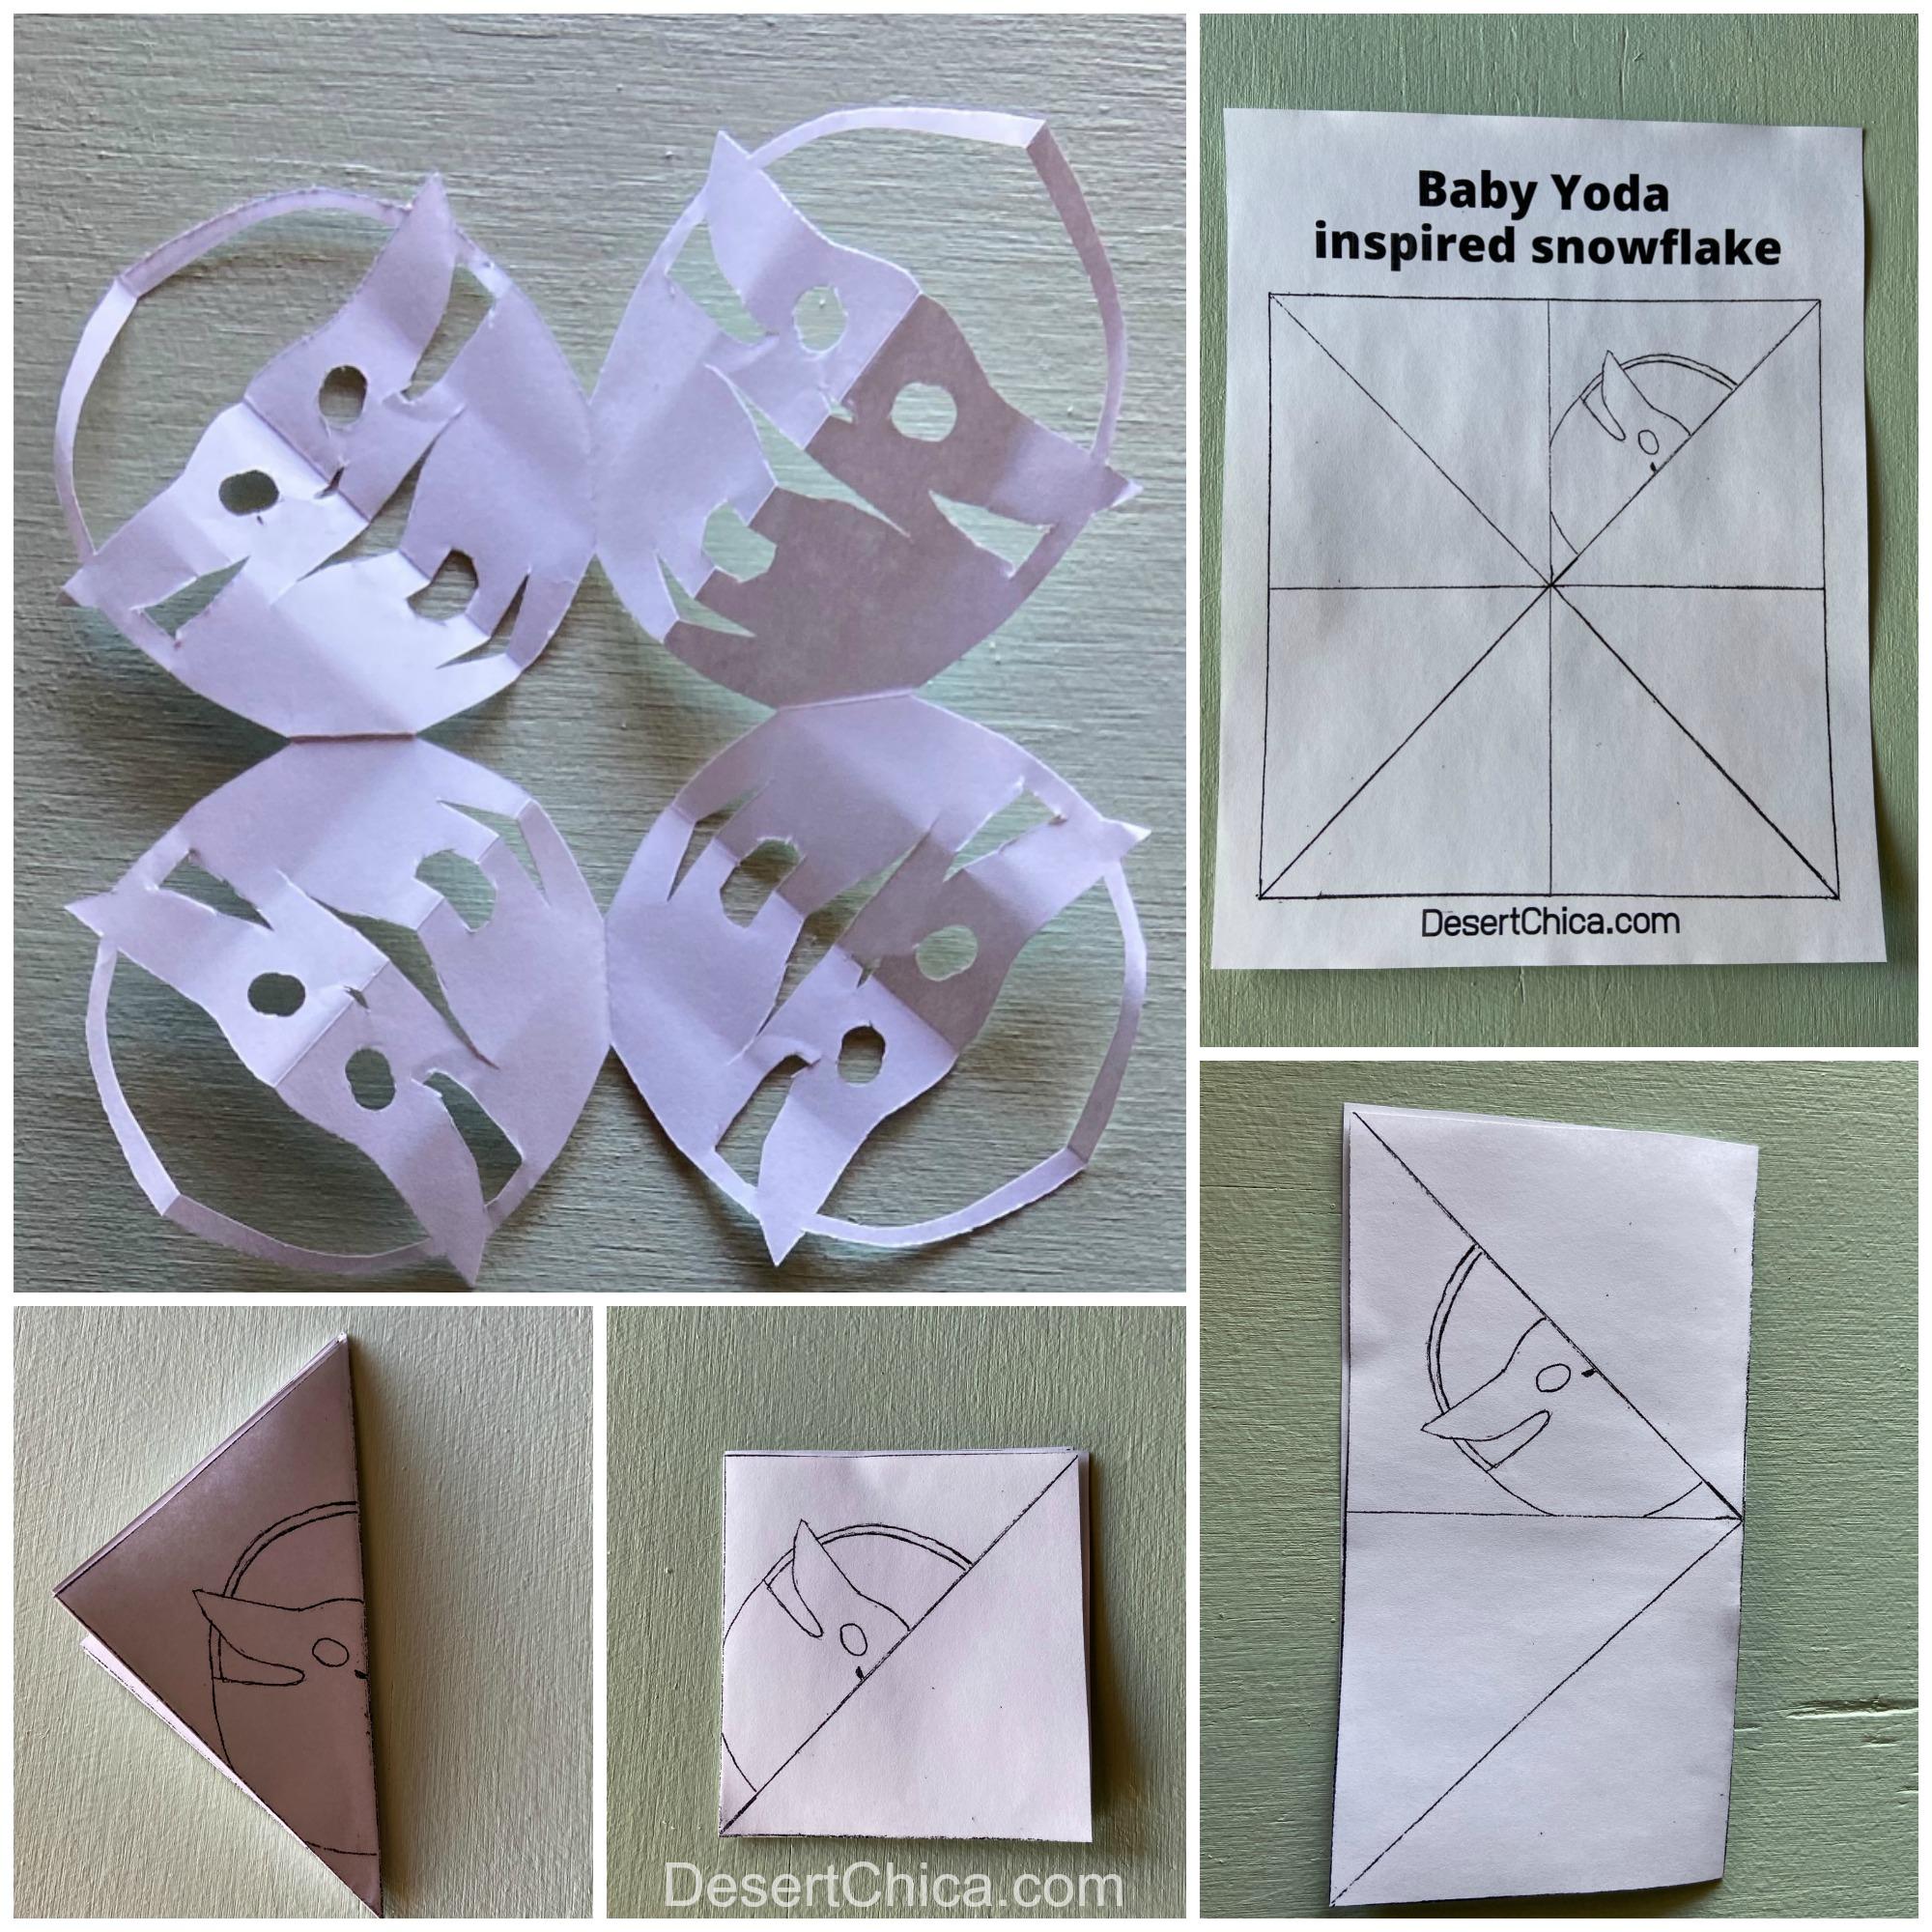 paper snowflakes baby yoda shapes